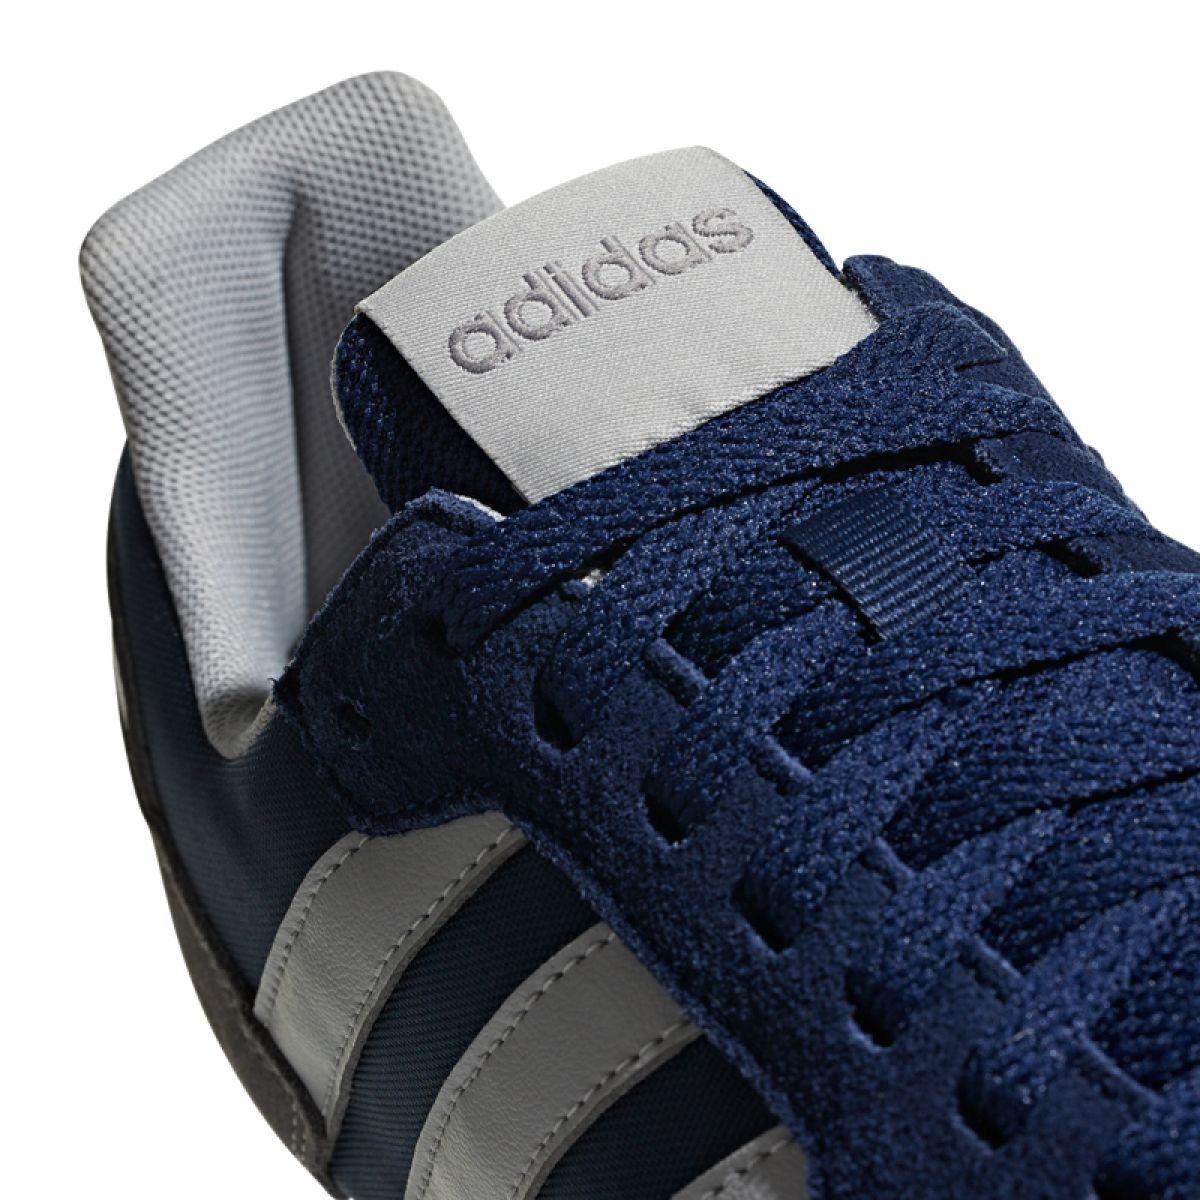 Buty Adidas 8k M B44669 Granatowe Shoes Adidas Fashion